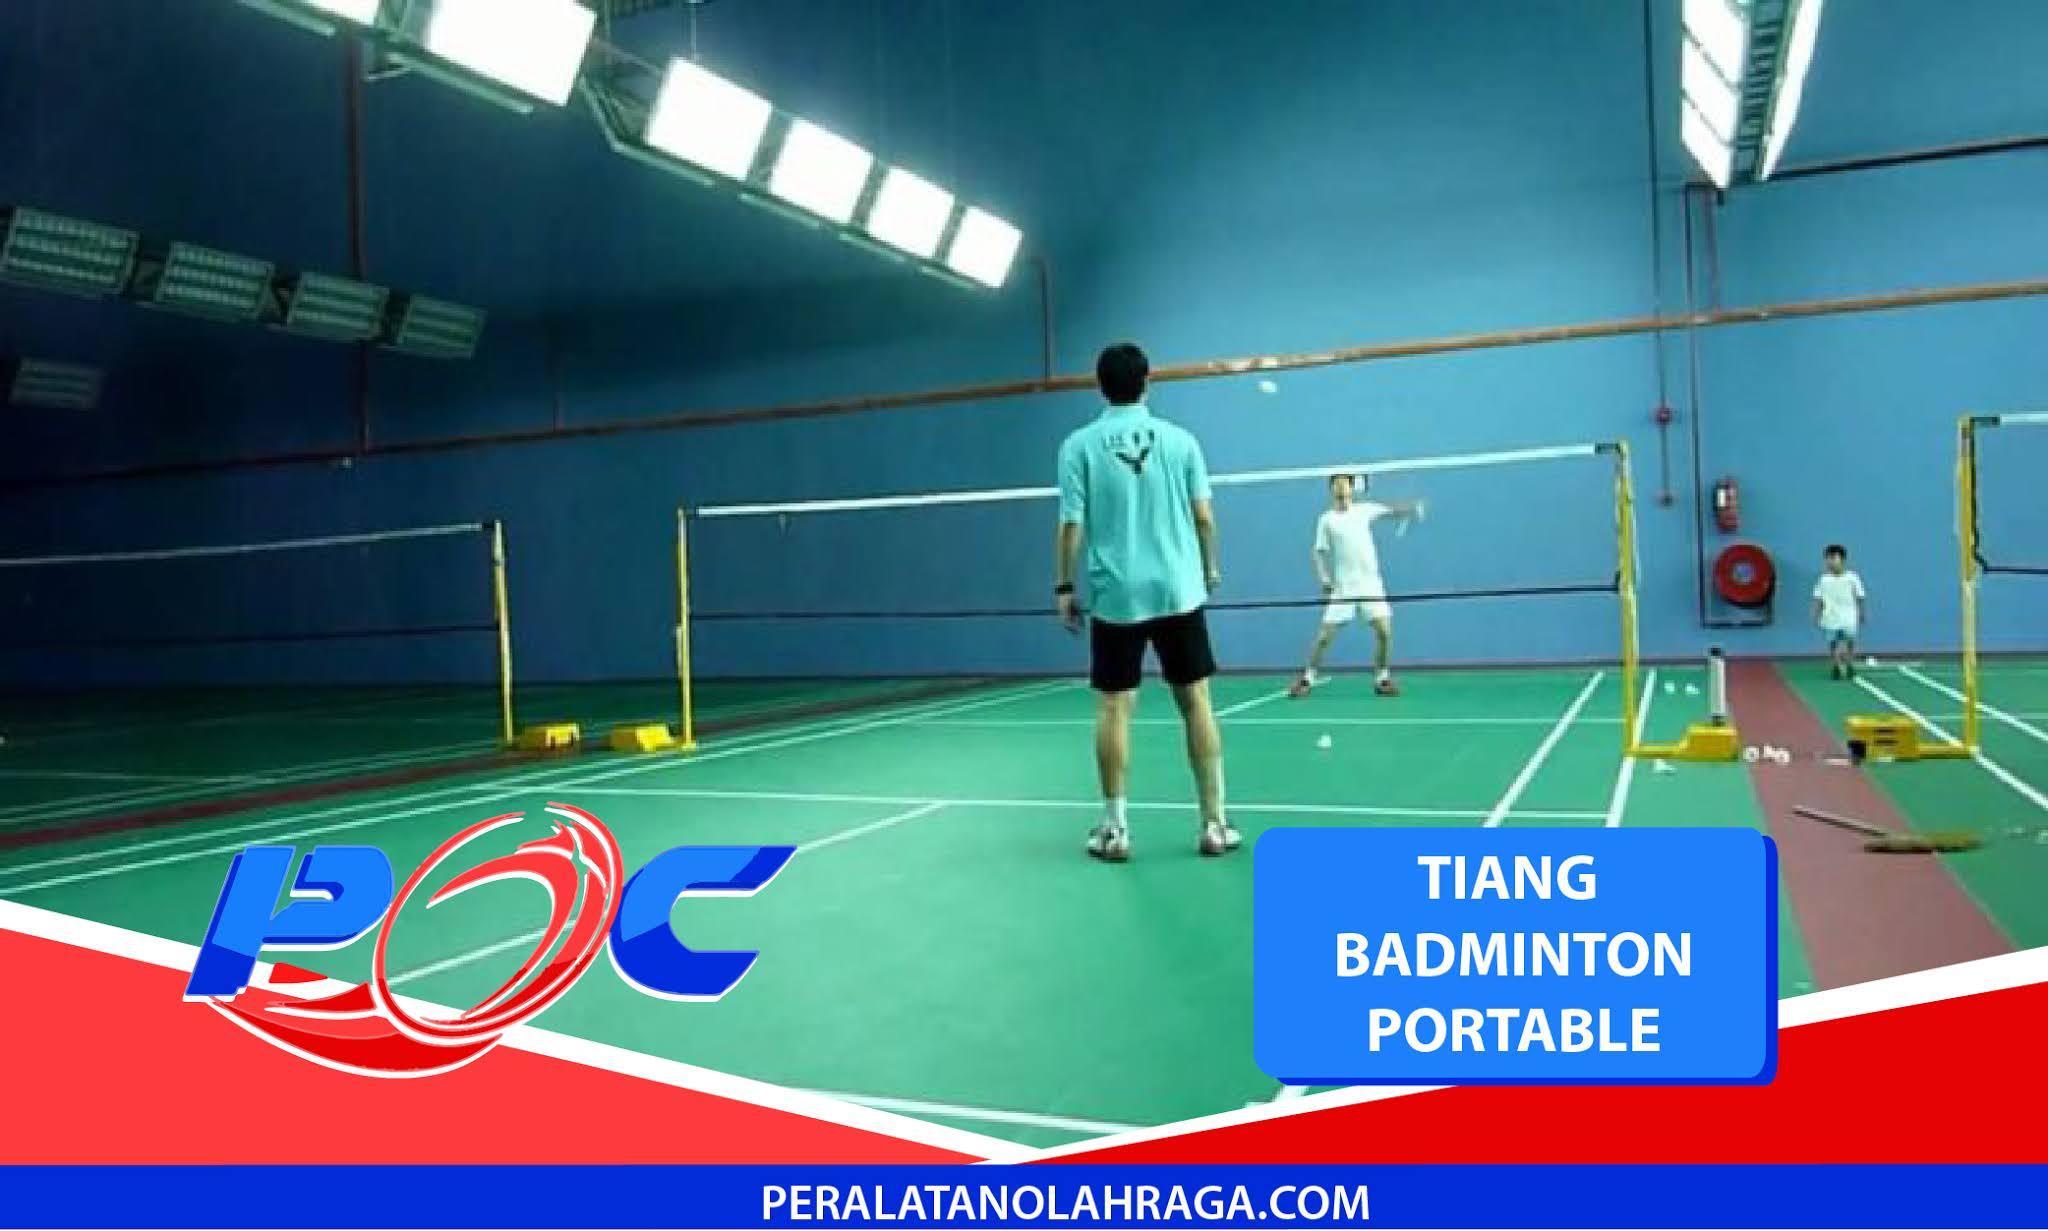 Net Badminton Portable